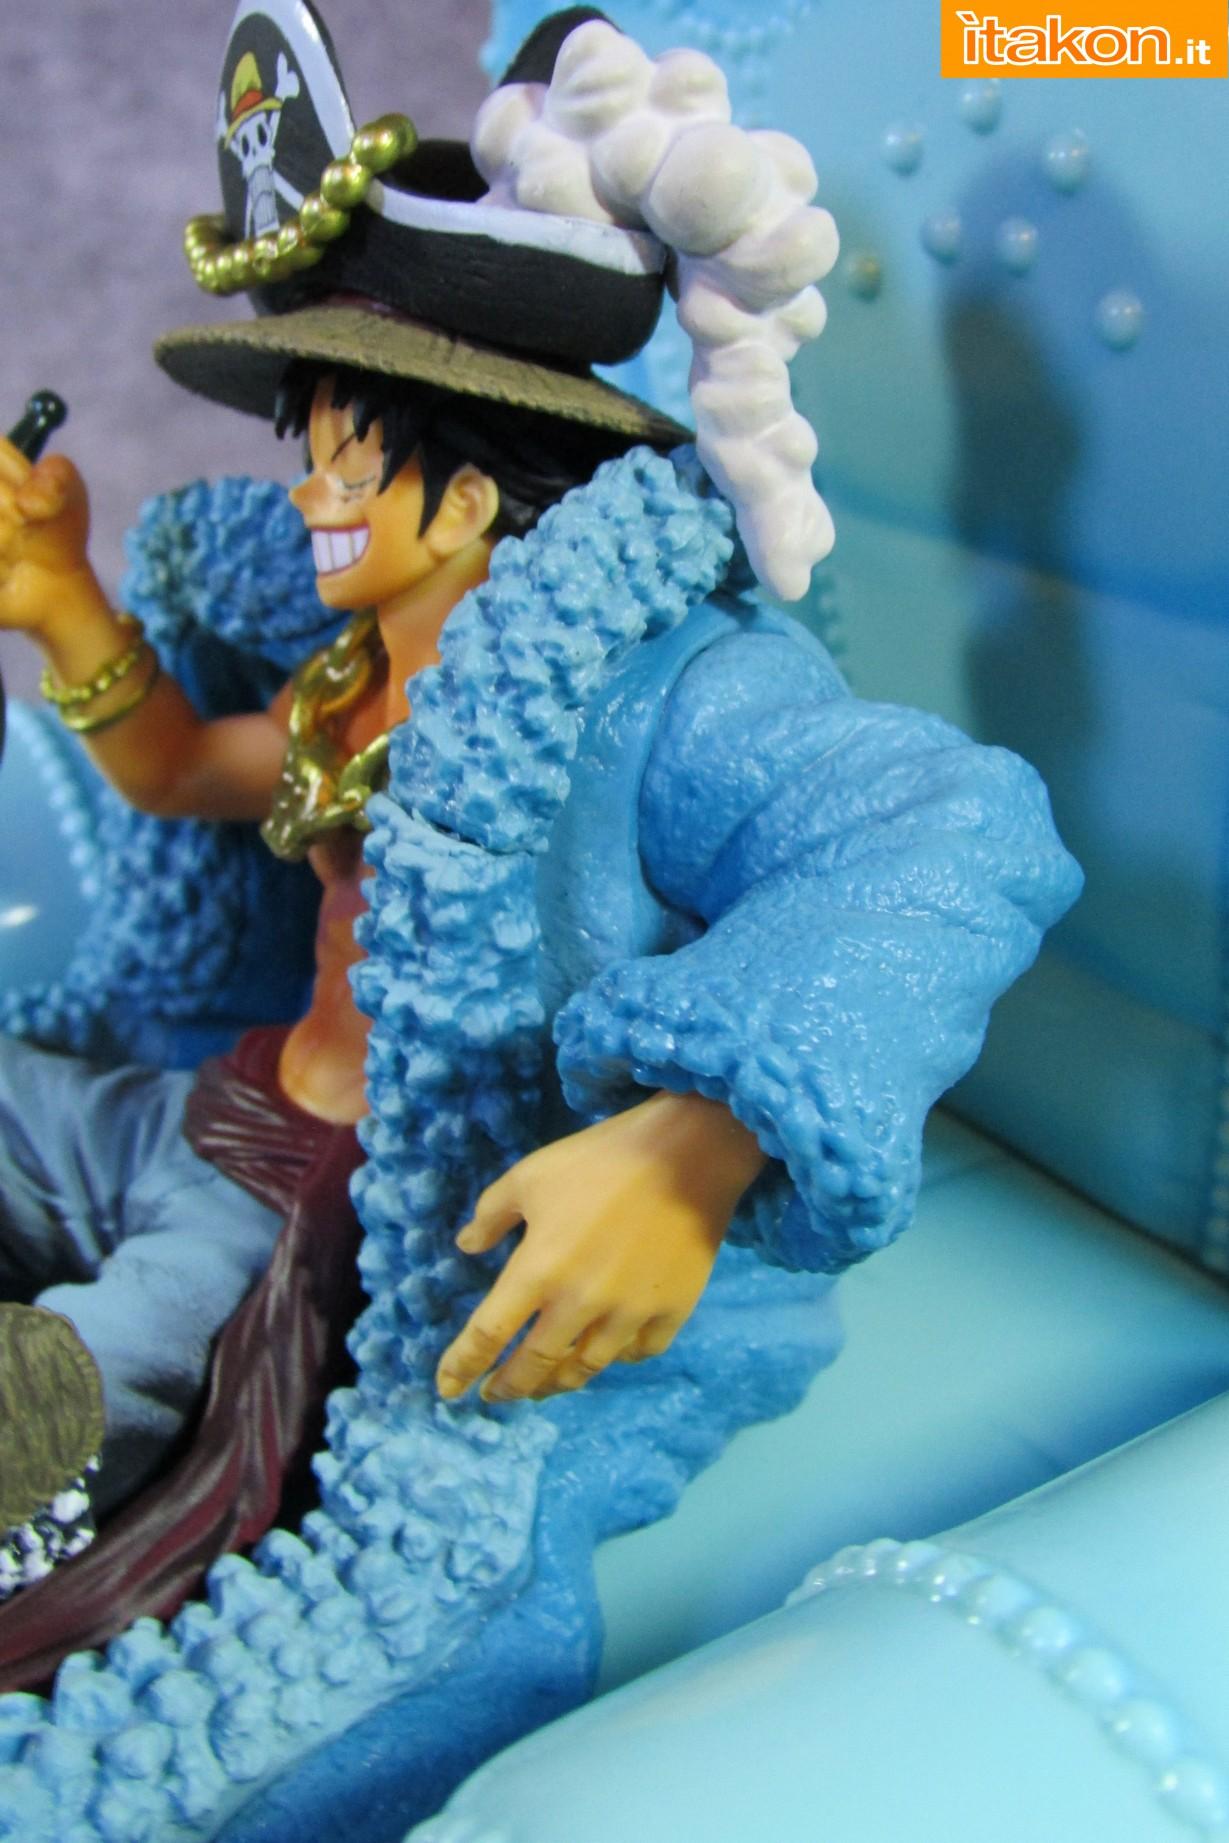 Link a Recensione Review Monkey D. Luffy One Piece 20th Anniversary ver. Figuarts ZERO di Bandai 29